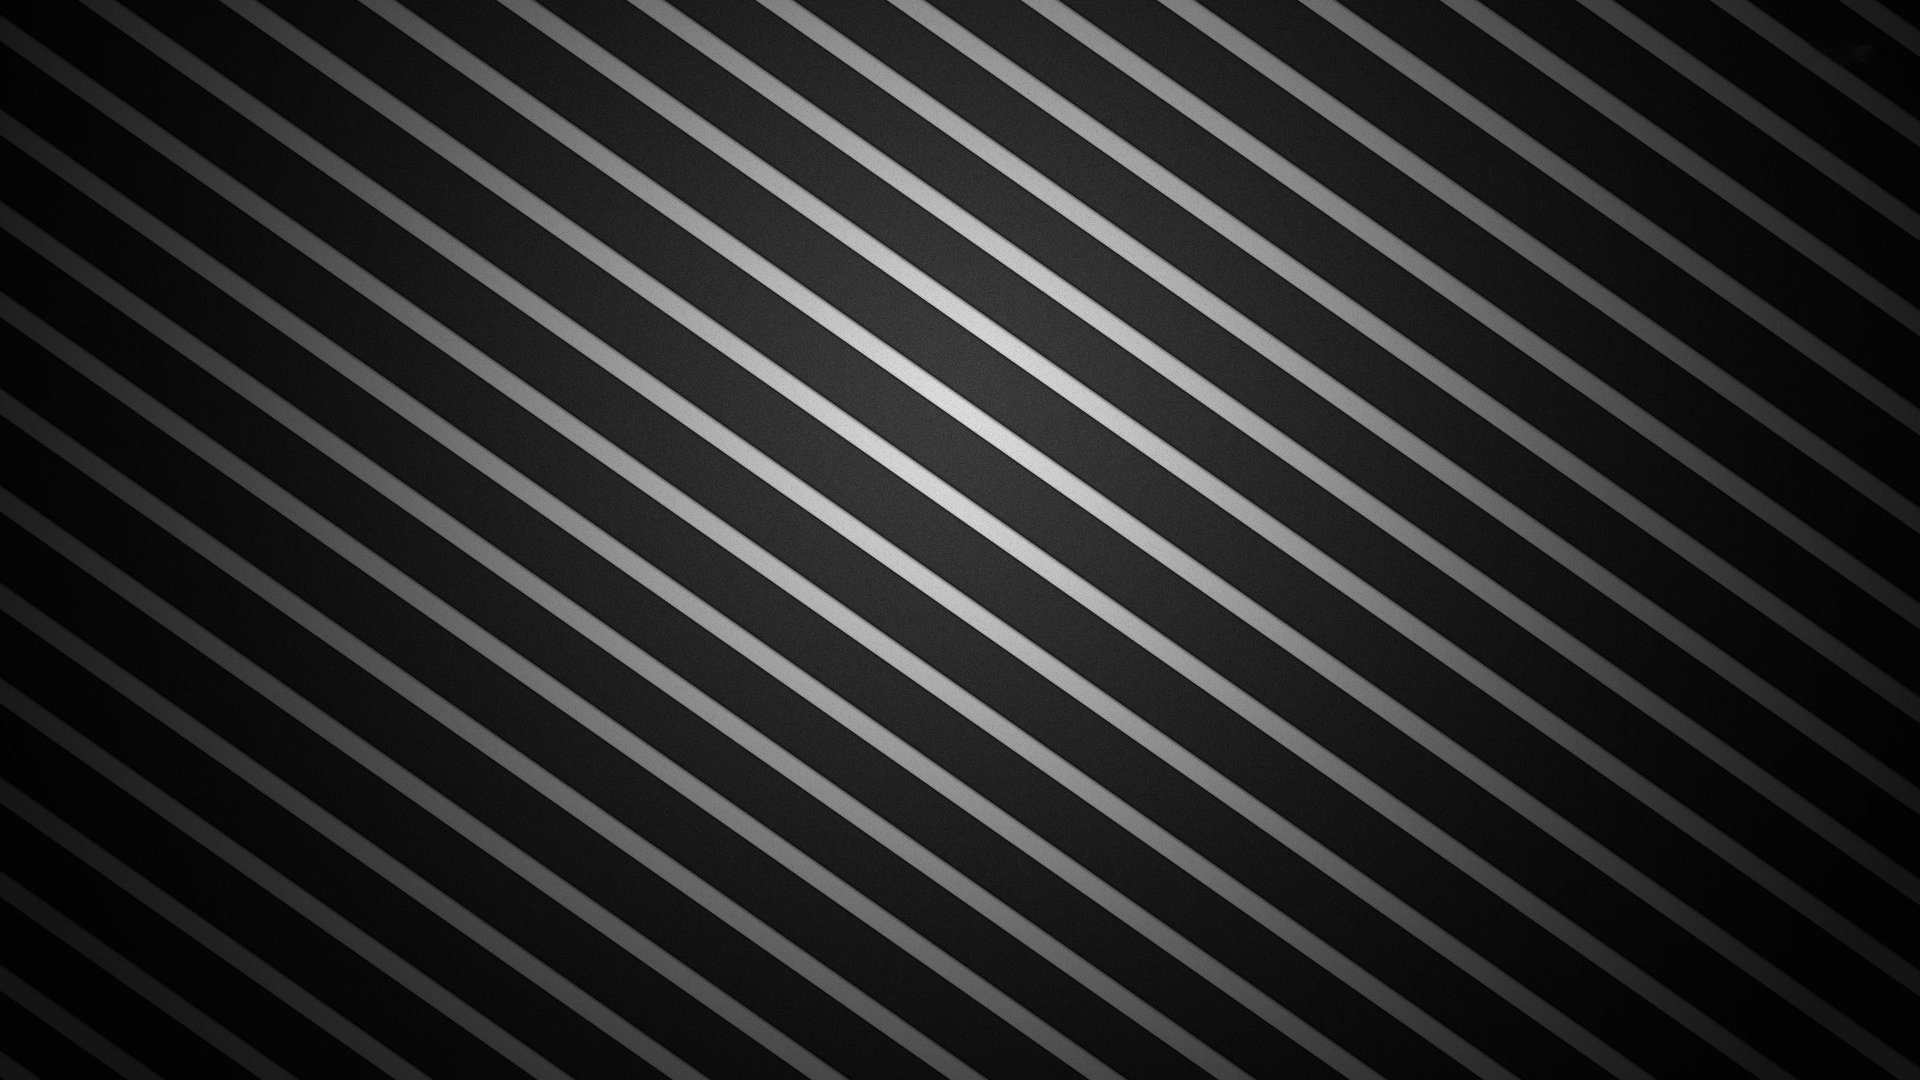 Black And Silver Wallpaper Hd Desktop Expo International